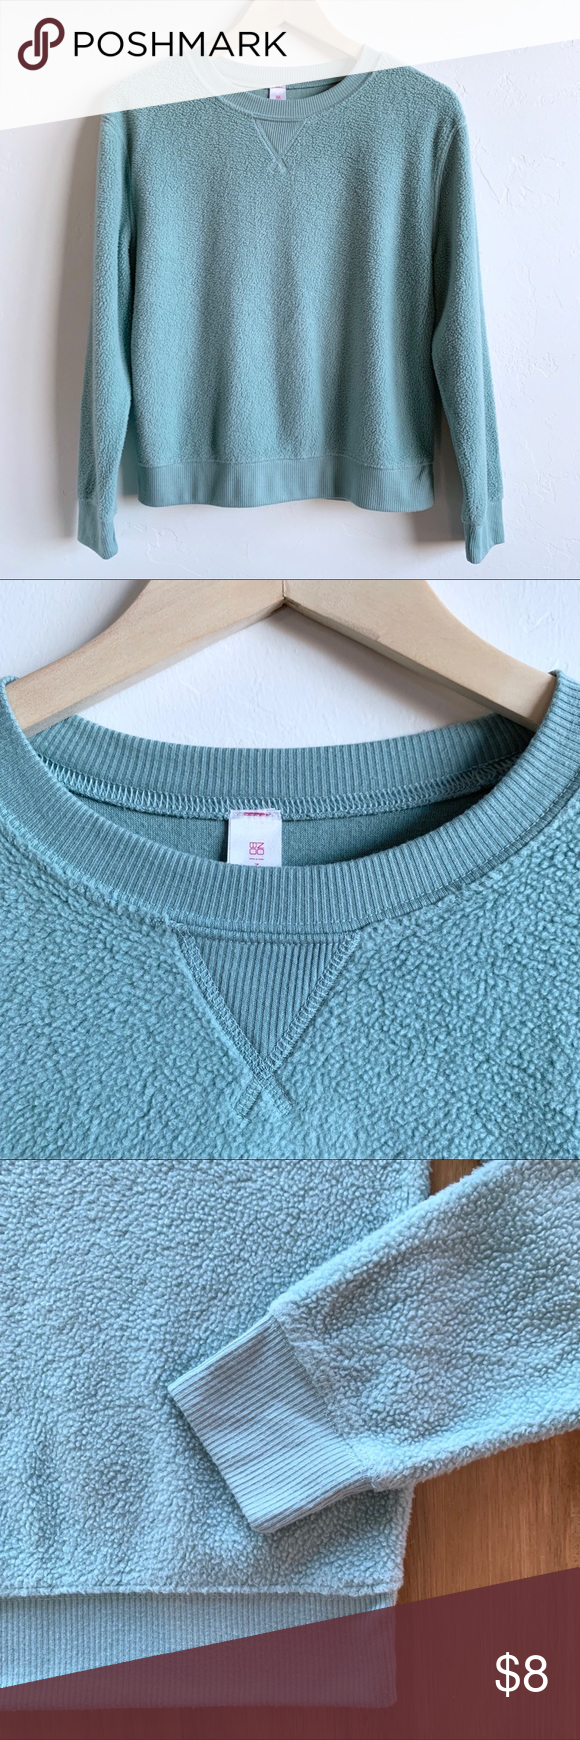 Small Cozy Sherpa Type Sweatshirt Sweatshirts Cozy Sherpa Sweatshirt Tops [ 1740 x 580 Pixel ]